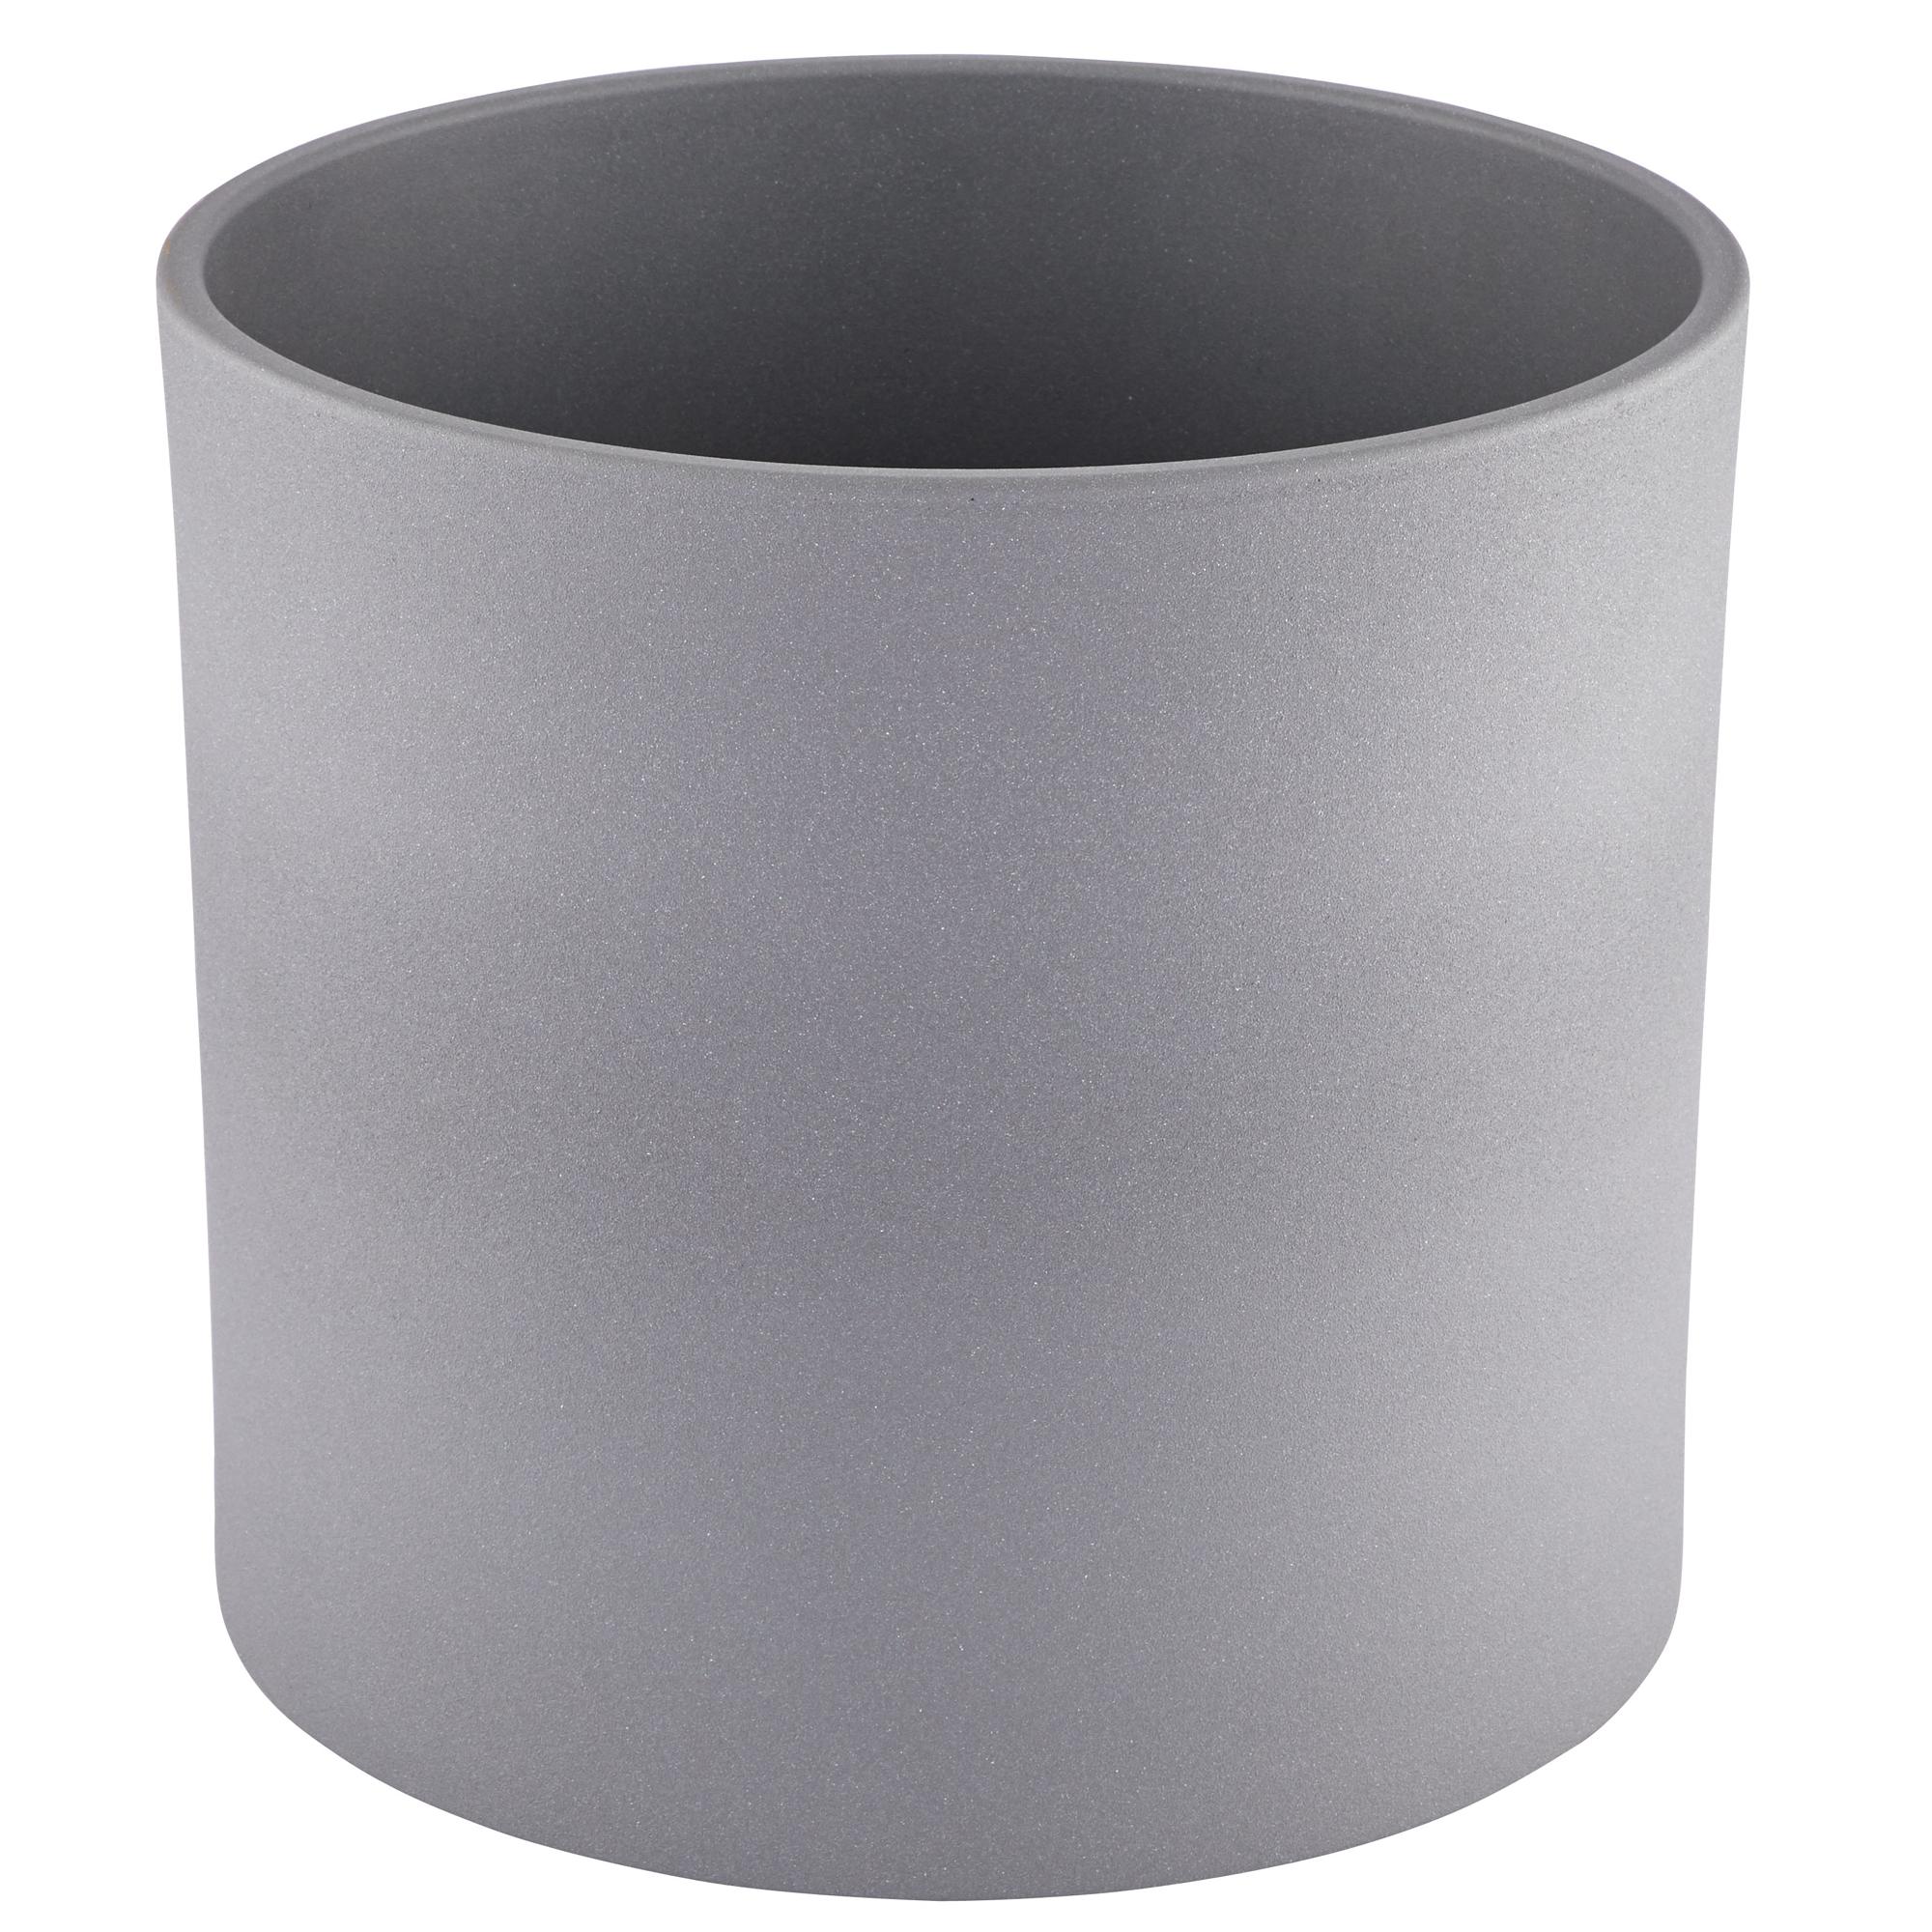 Übertopf 'Cari' grau Ø 11 cm